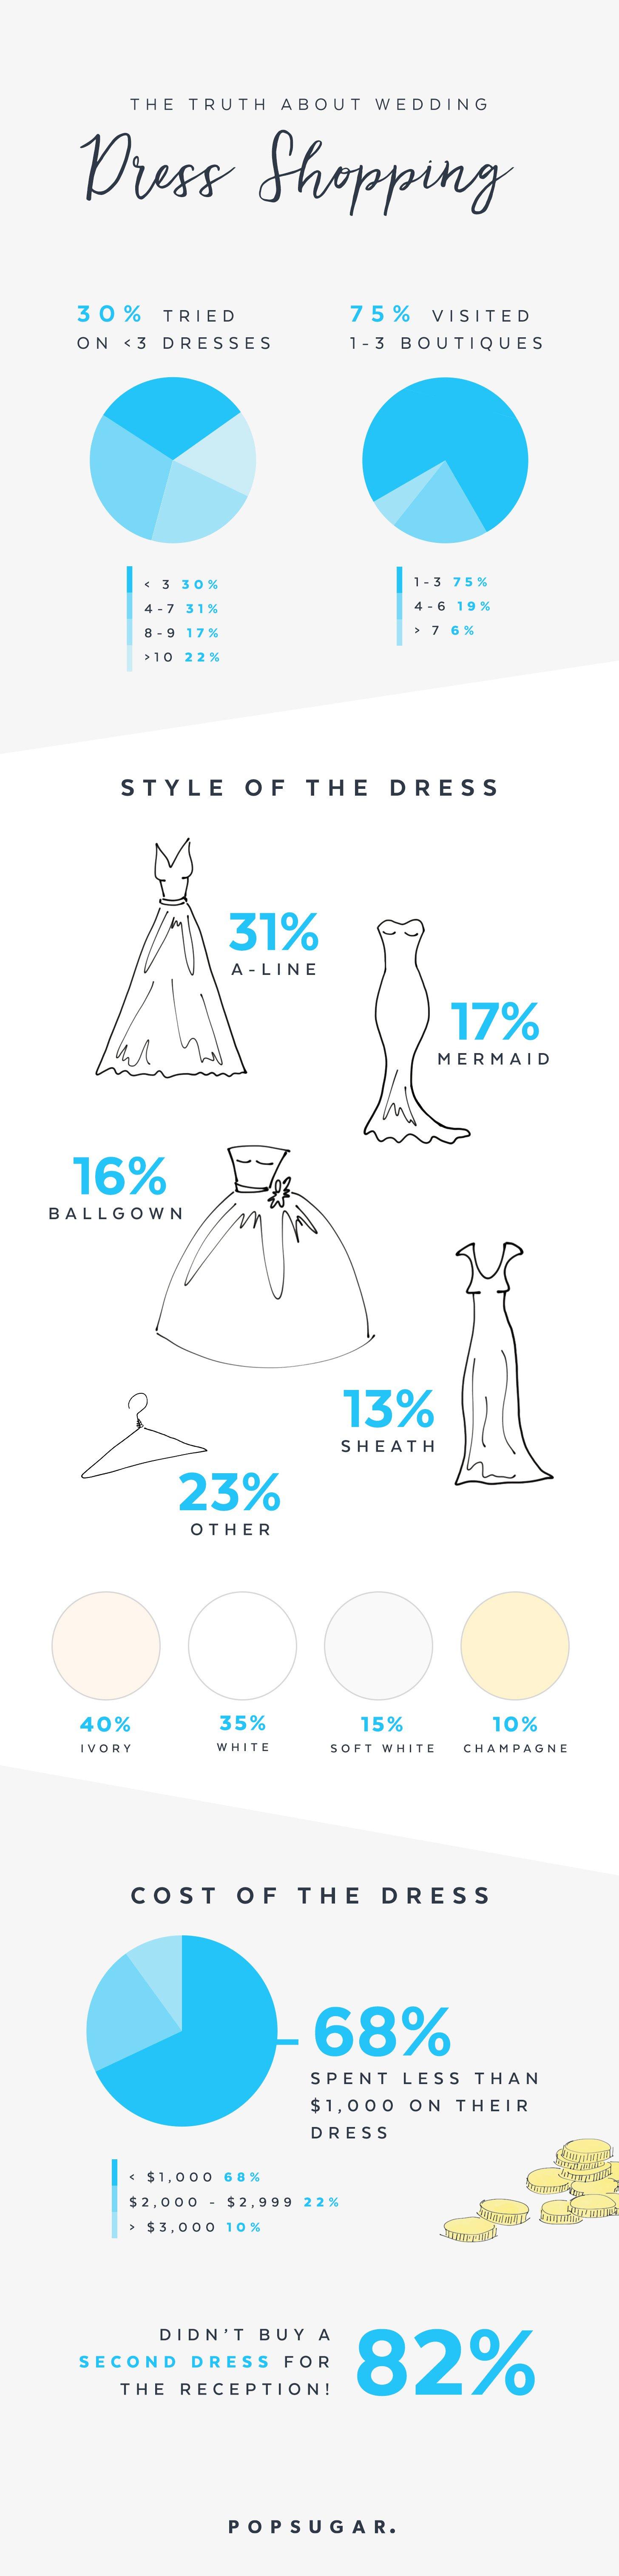 PW-wedding-dress-stats